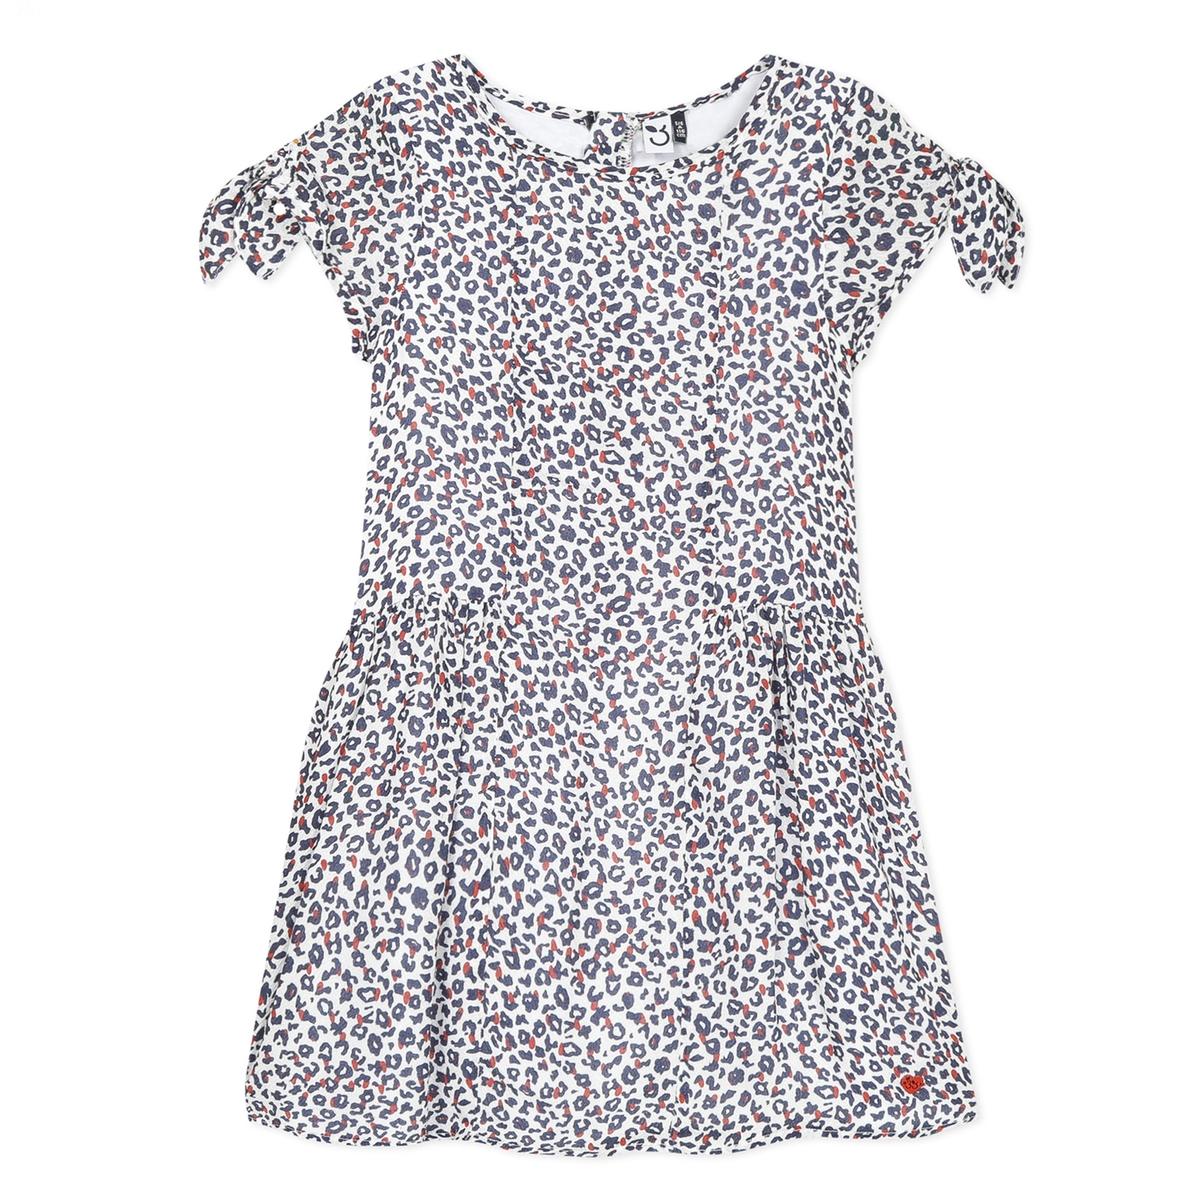 Leopard Print Dress 3 4 Years